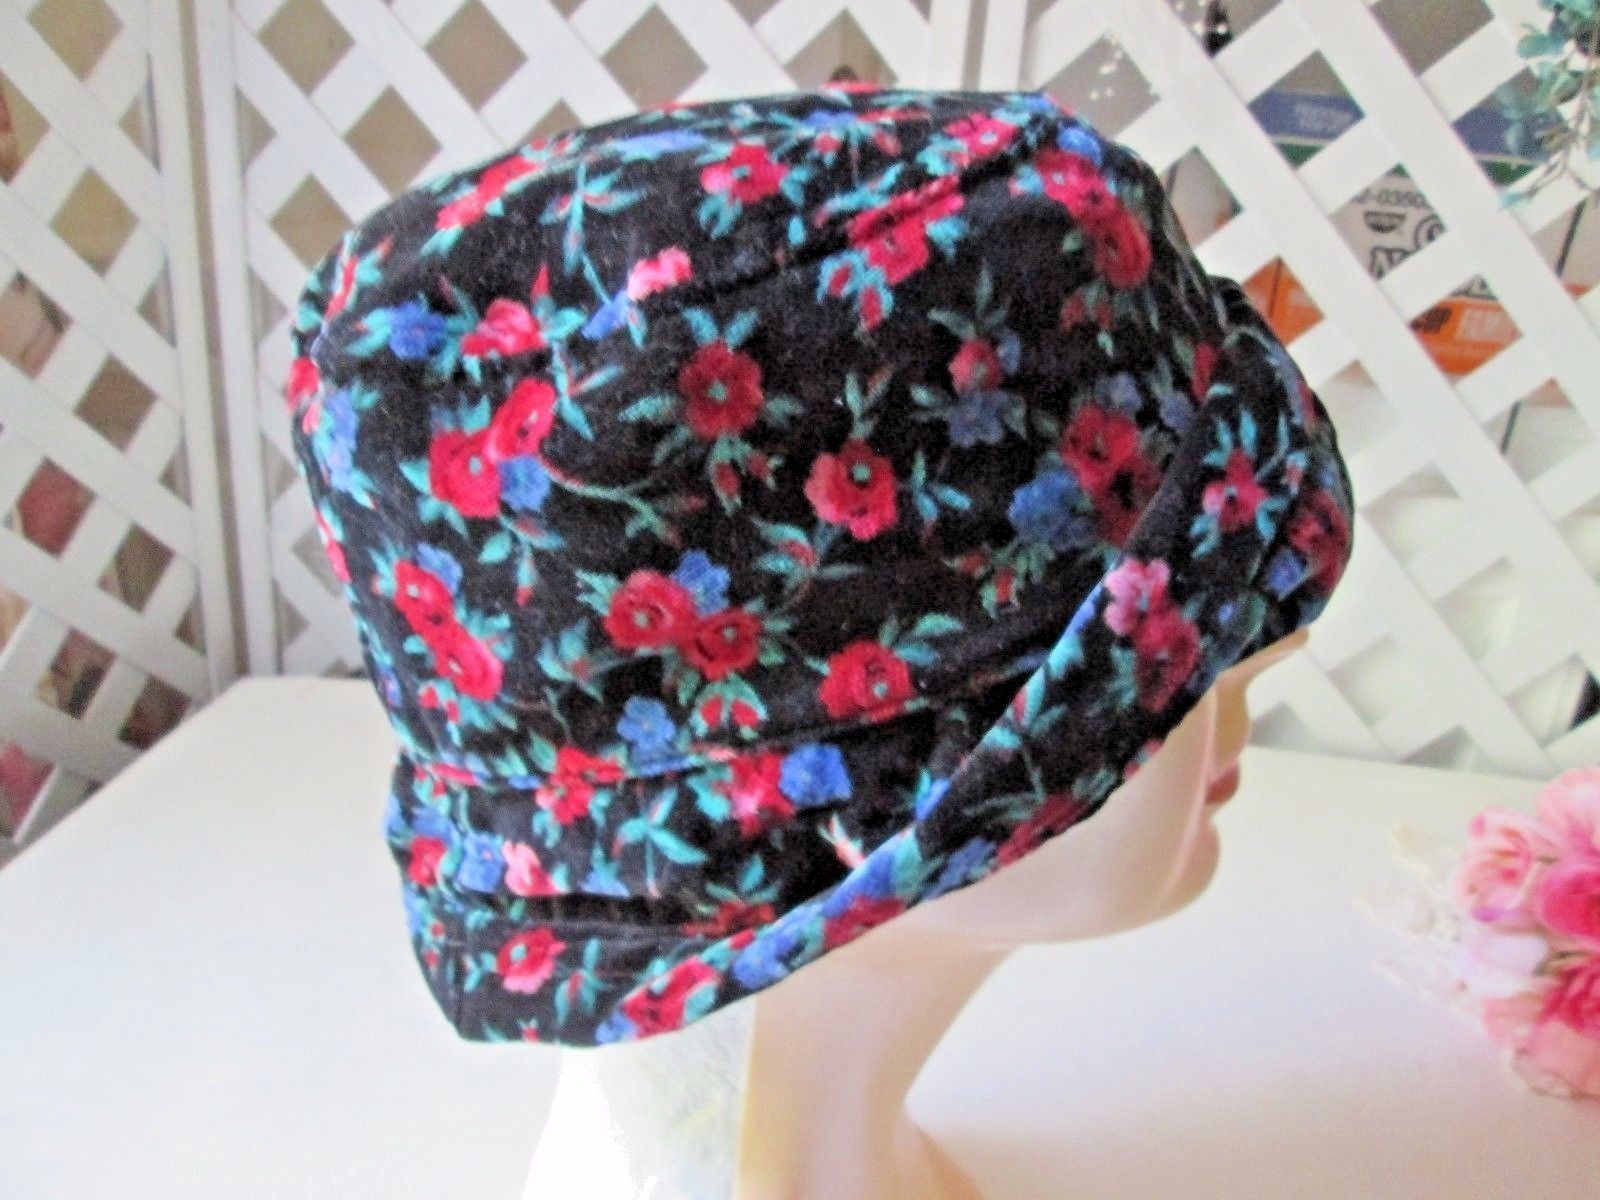 96a2fdb96bad2 Floral black velvet bucket hat The Gap L and 50 similar items